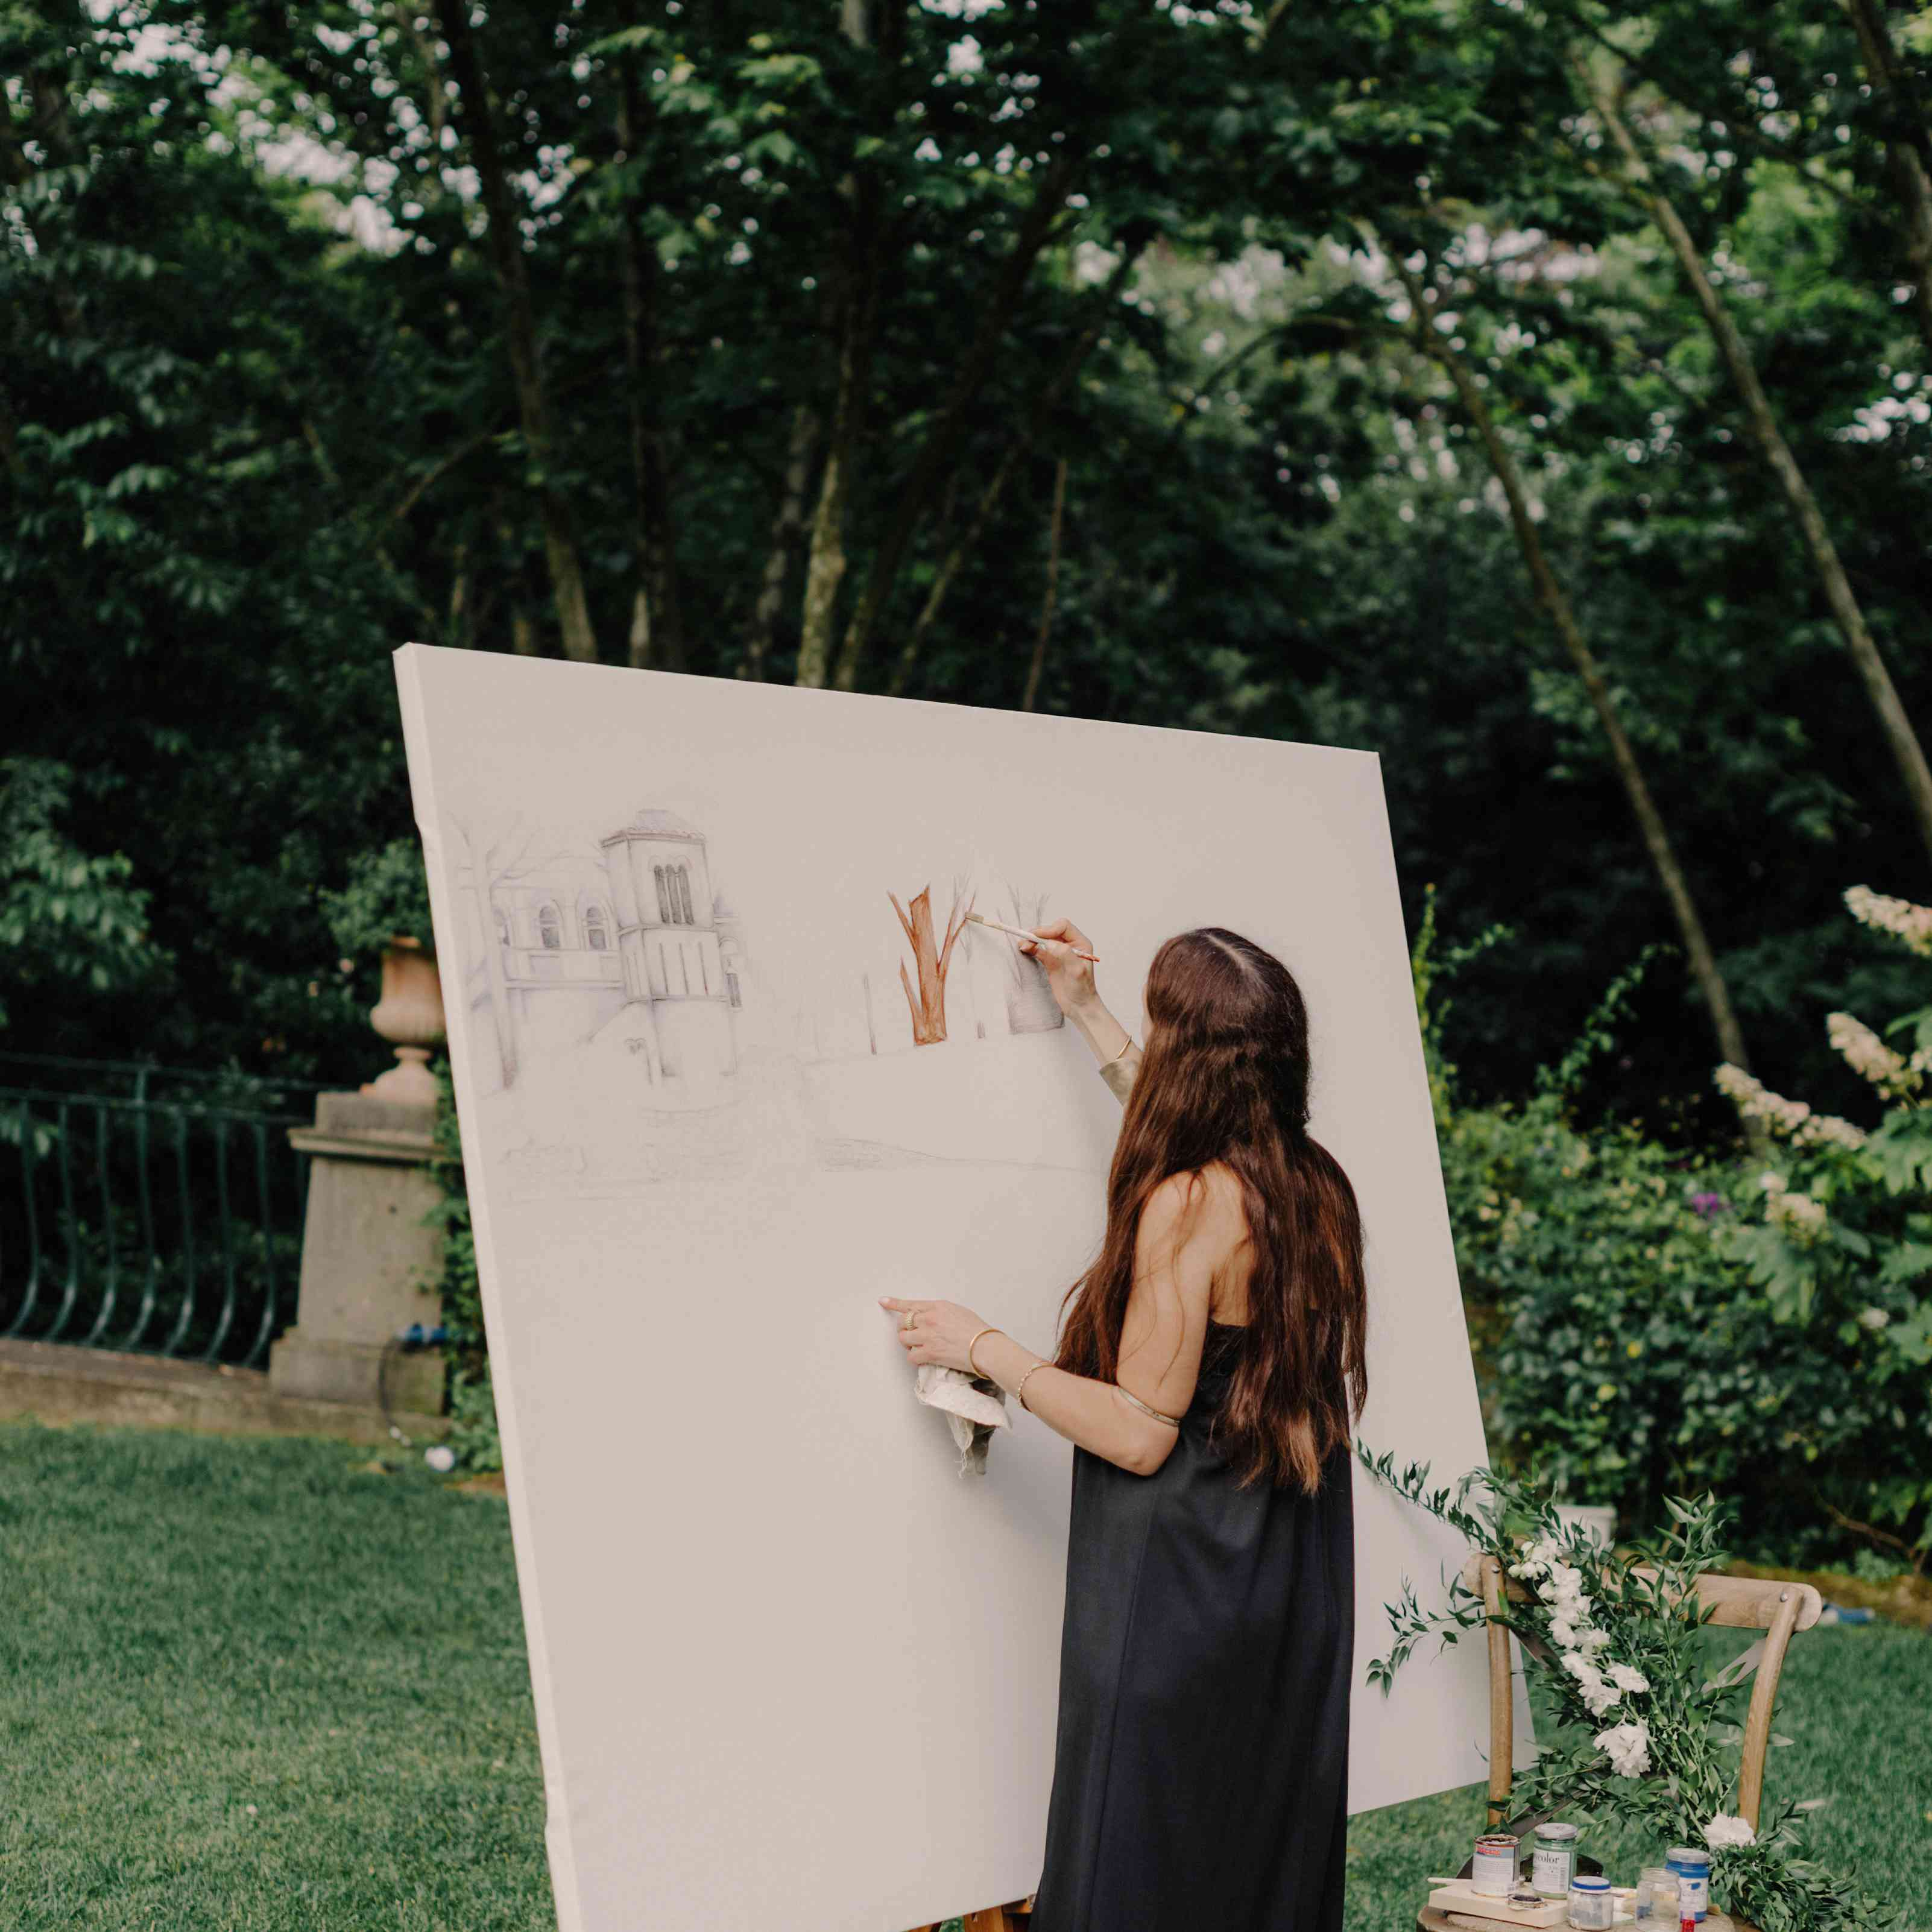 Artist Live Painting